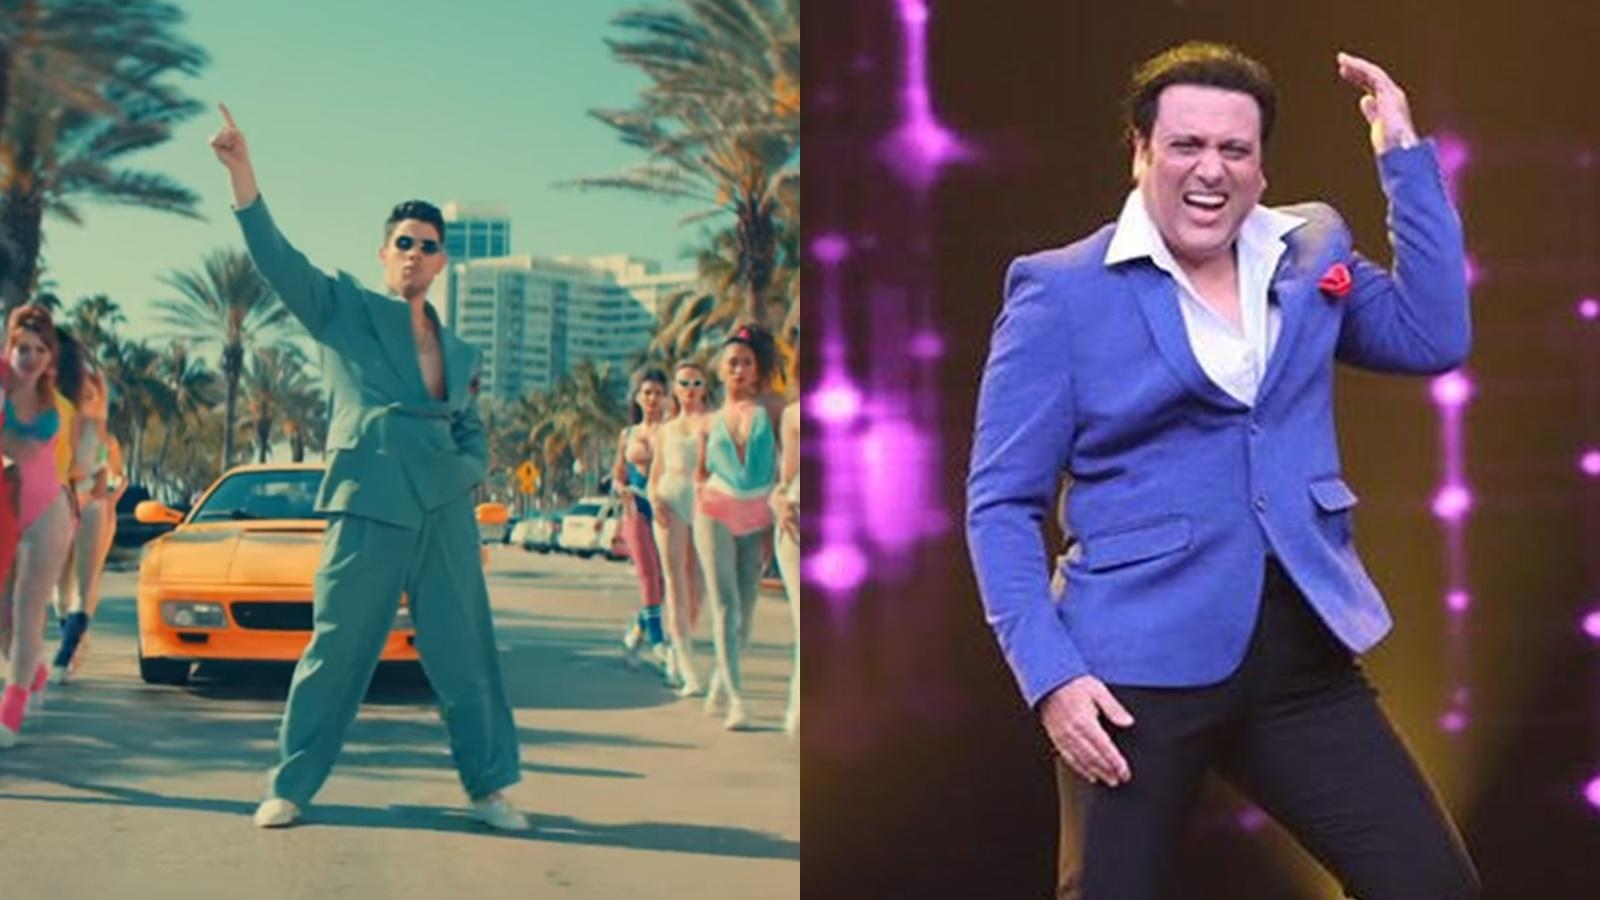 Priyanka Chopra makes husband Nick Jonas dance to Govinda's hit number 'Meri Pant Bhi Sexy'